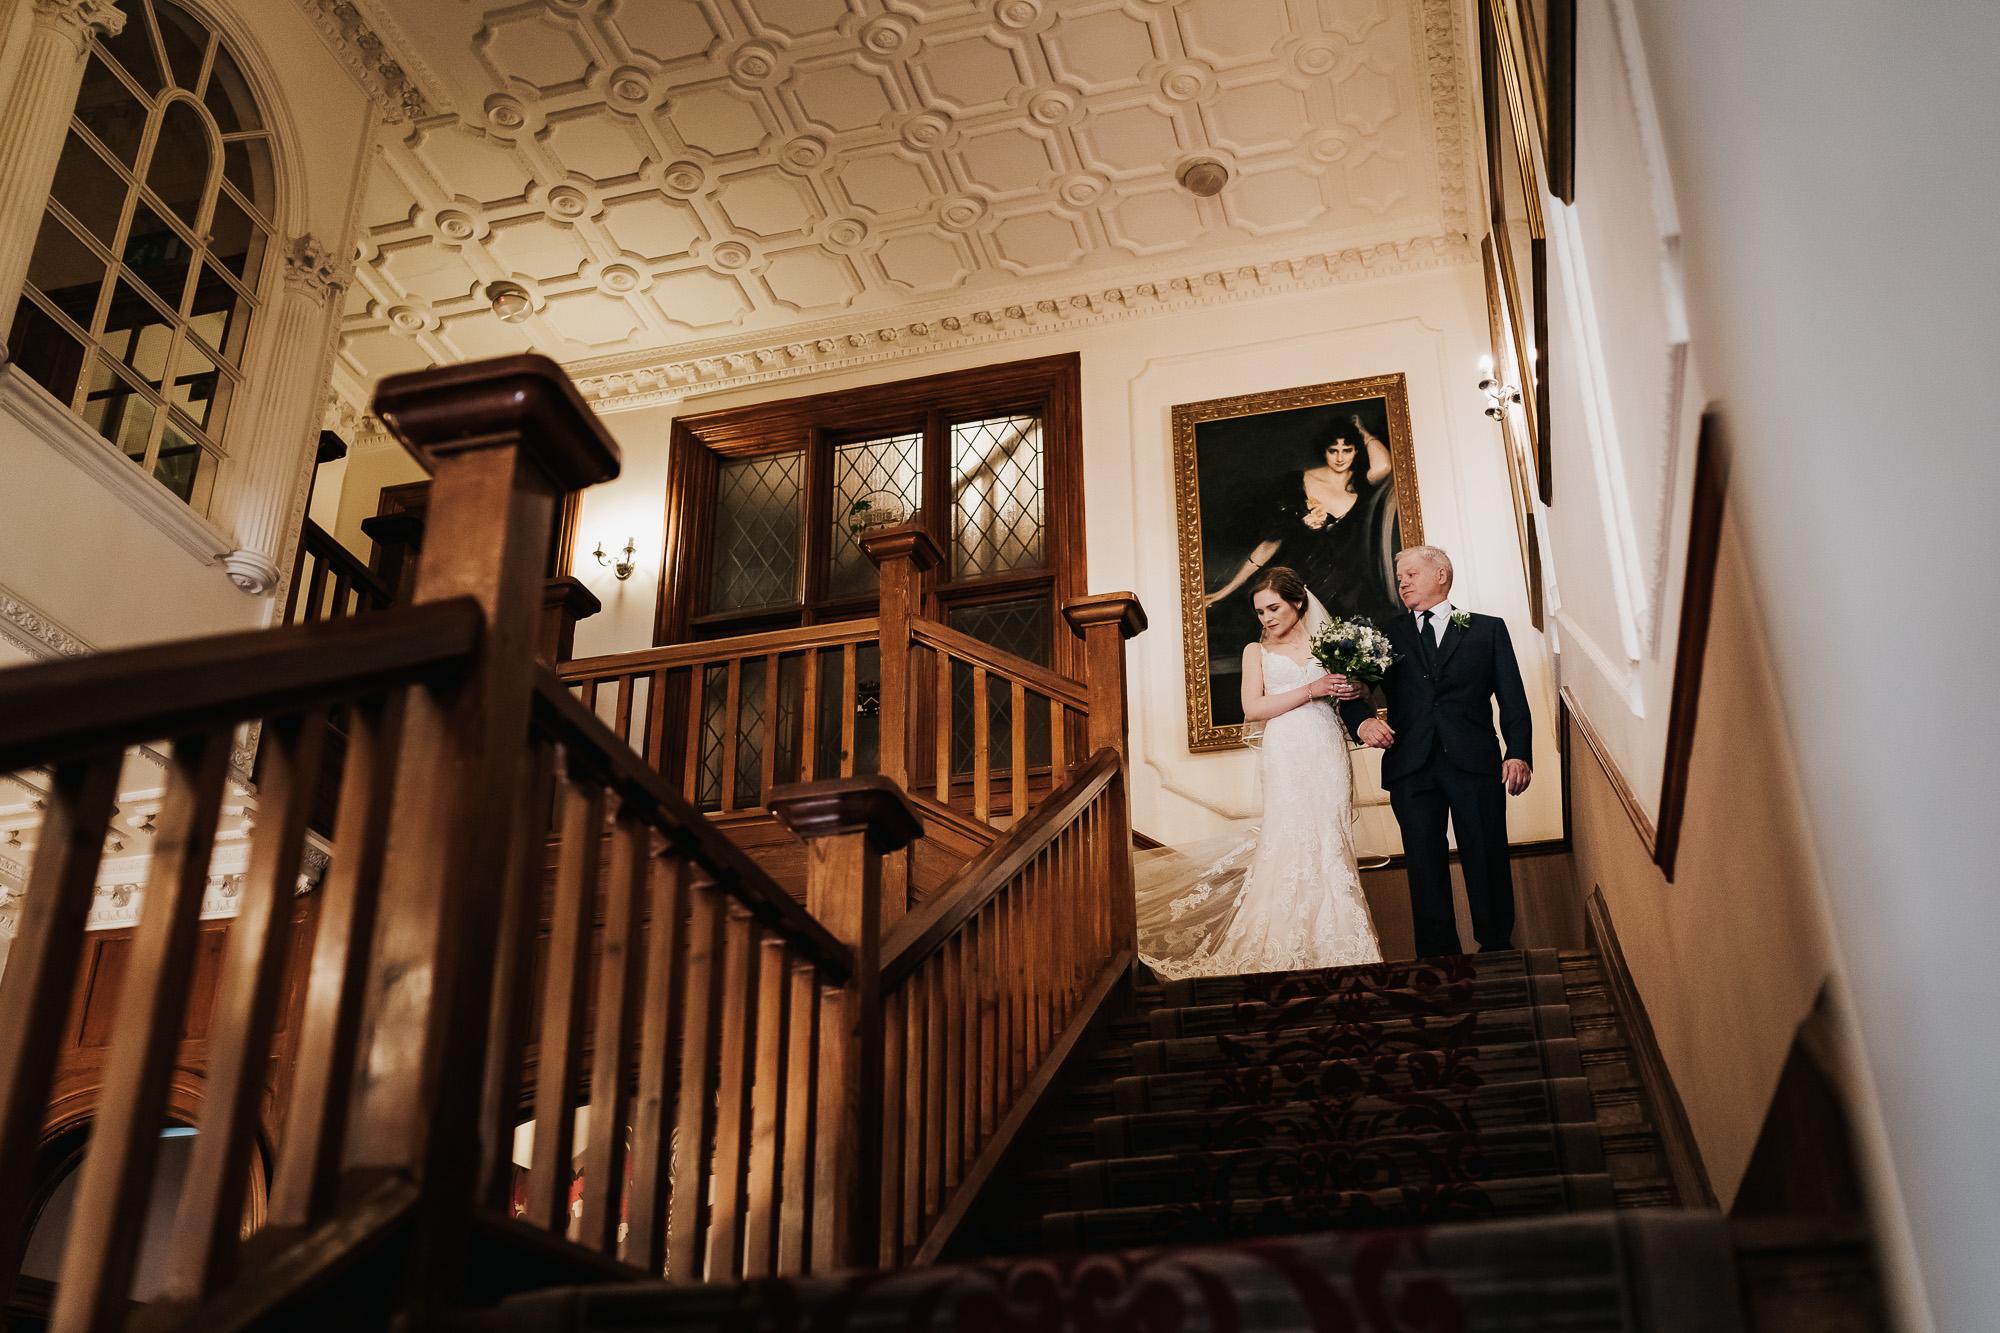 Nunsmere Hall Hotel Wedding photograhpy in cheshire wedding photographer (13 of 42).jpg